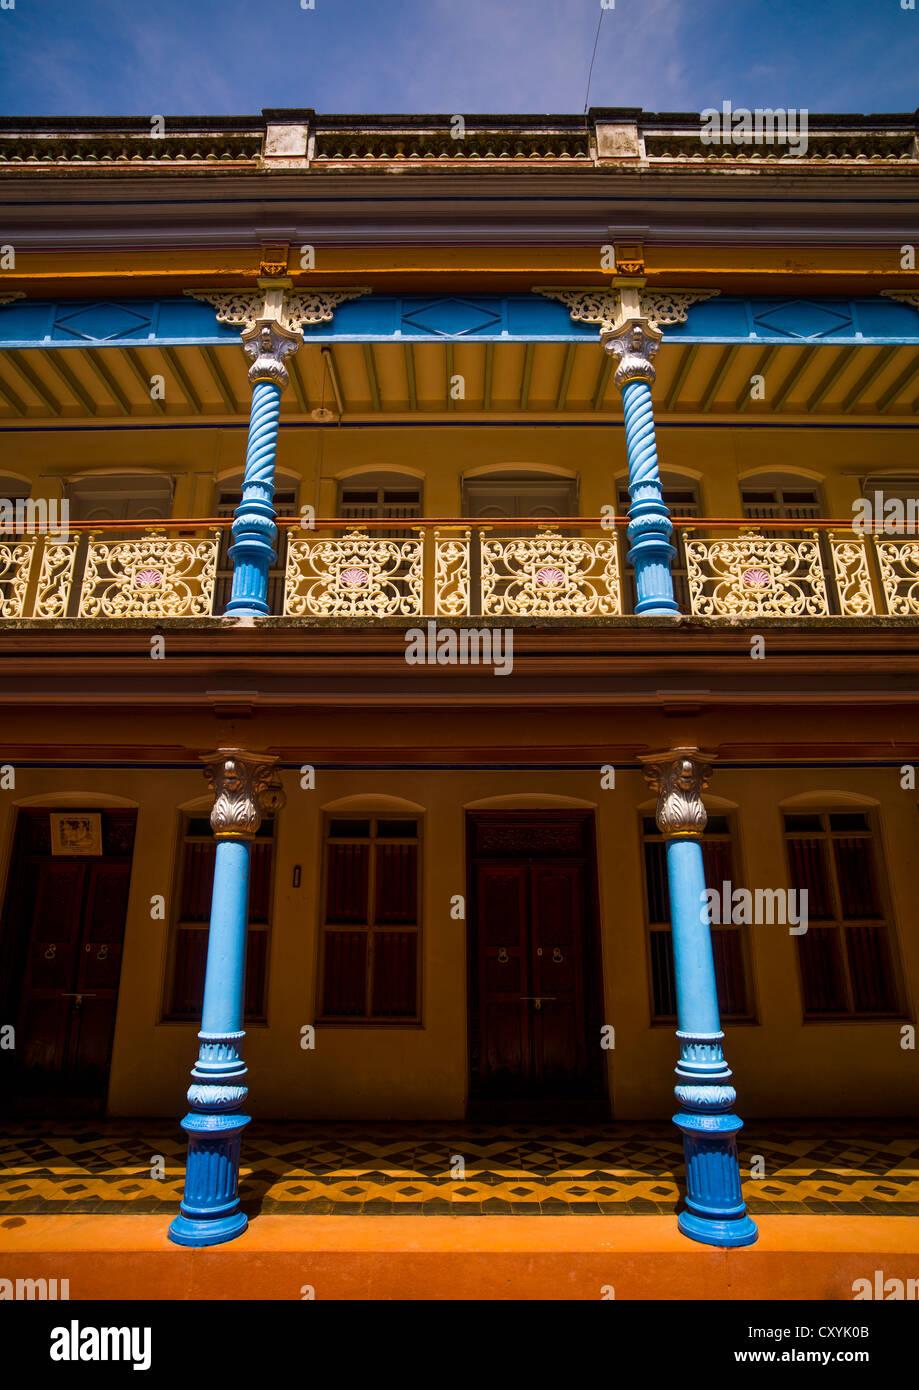 Courtyard Of Chettinad Mansion In Kanadukathan Chettinad, India - Stock Image